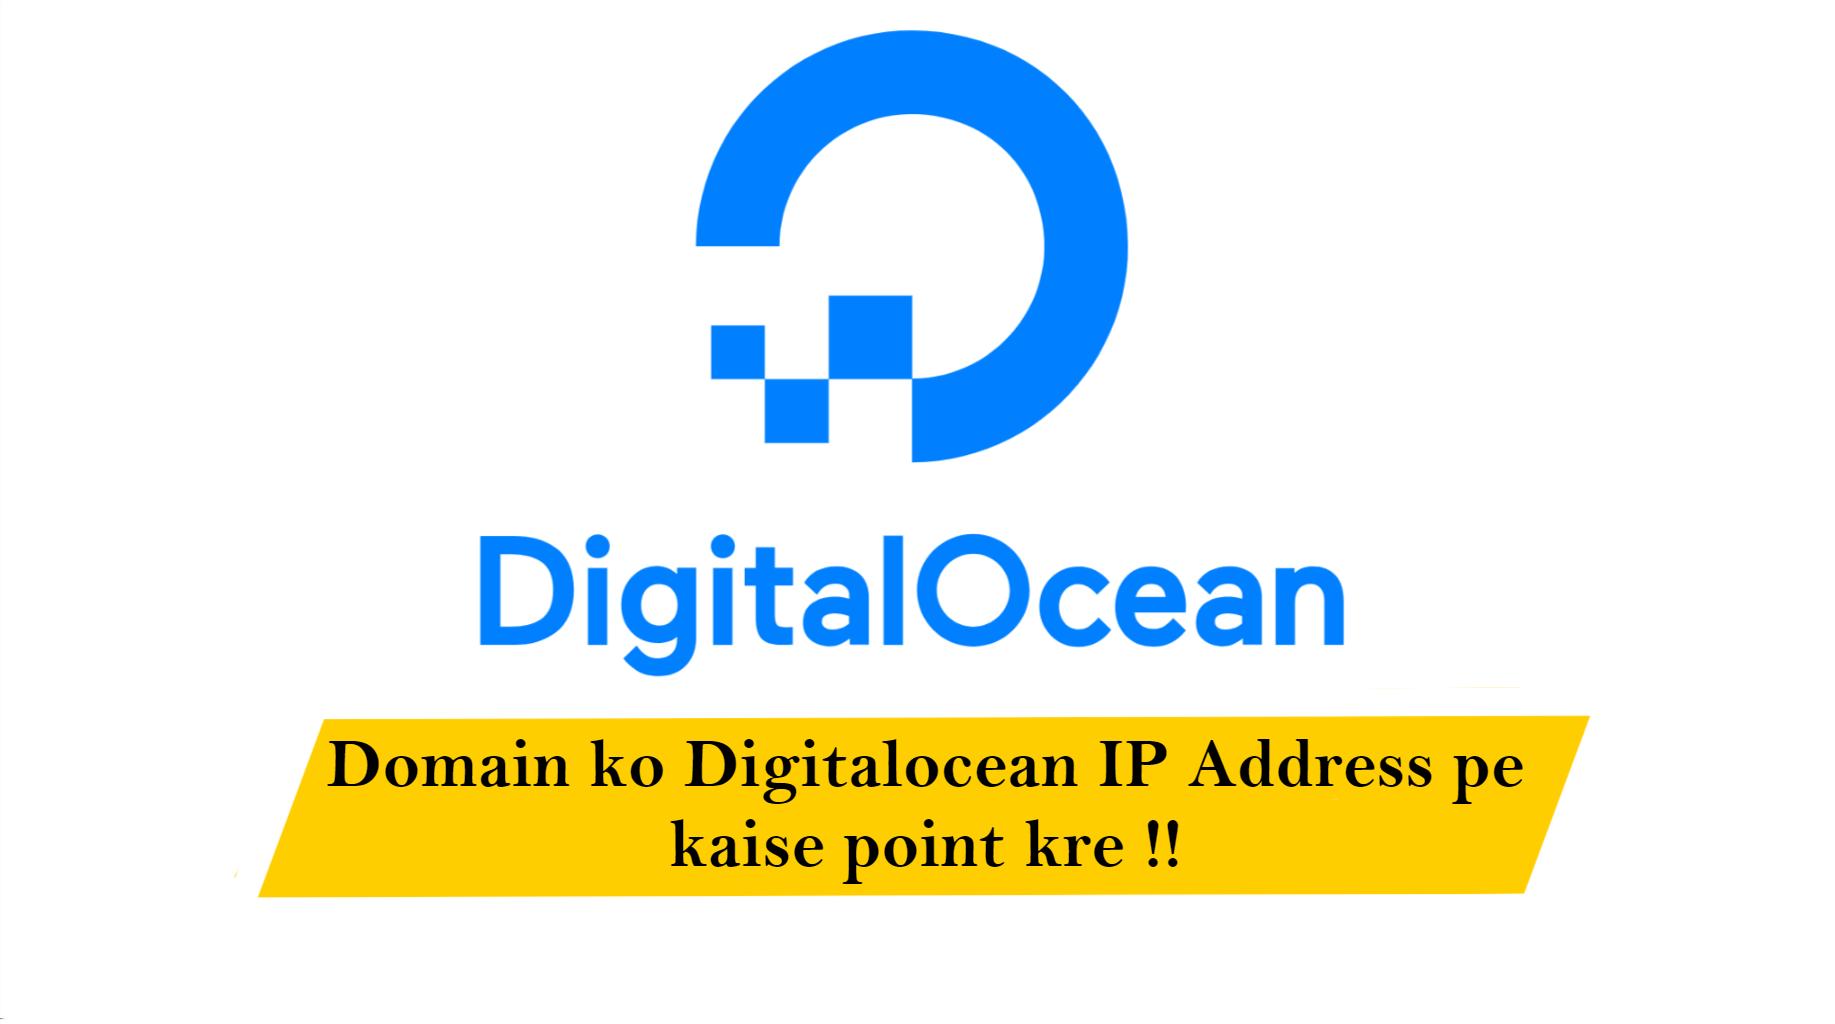 Domain ko Digitalocean IP Address pe kaise point kre !!